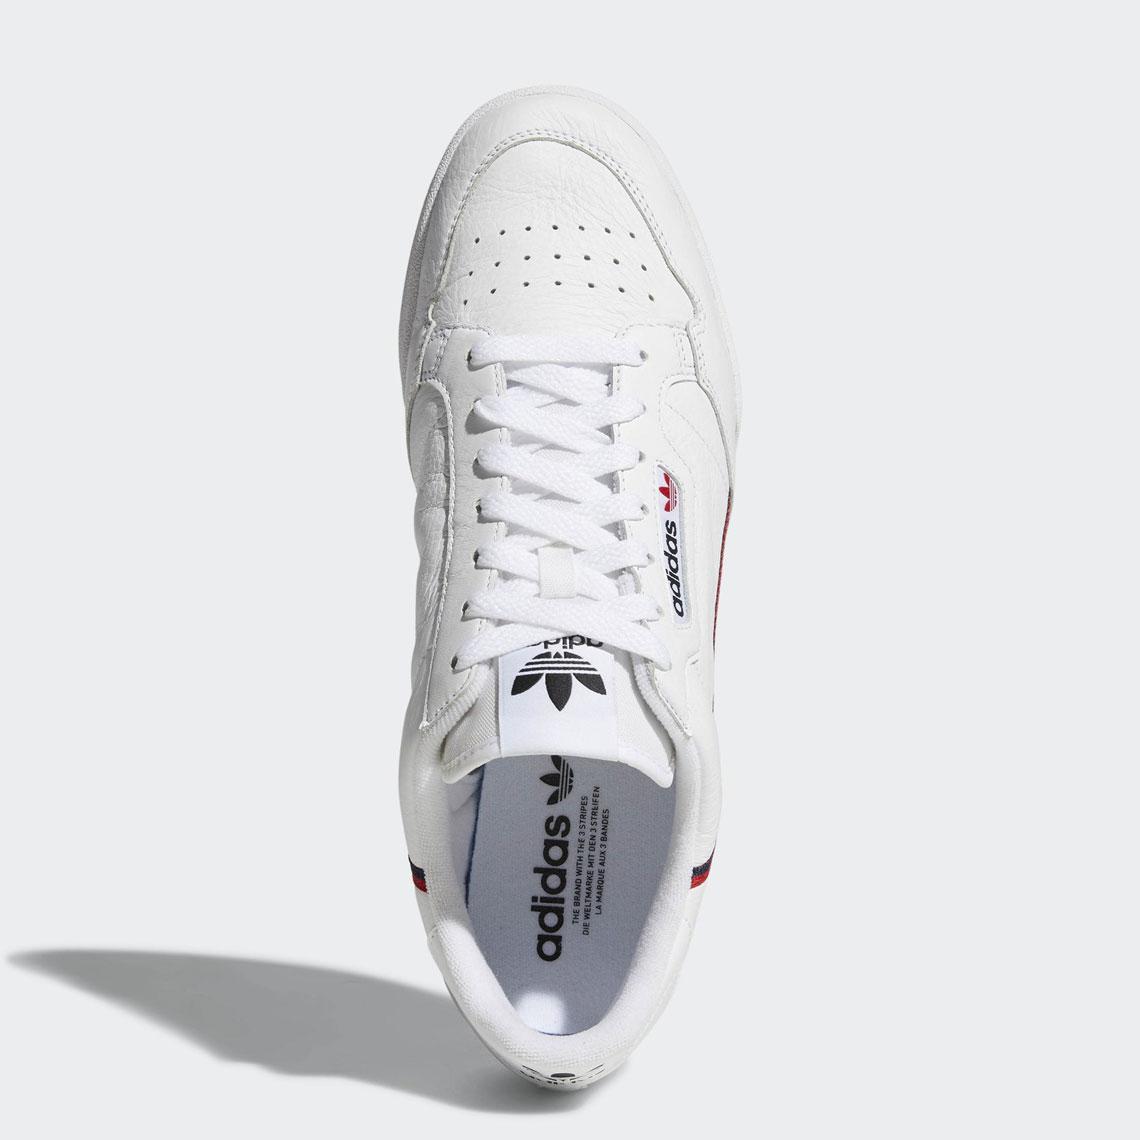 4912a708167e05 adidas Rascal B41680 + B41674 Release Info